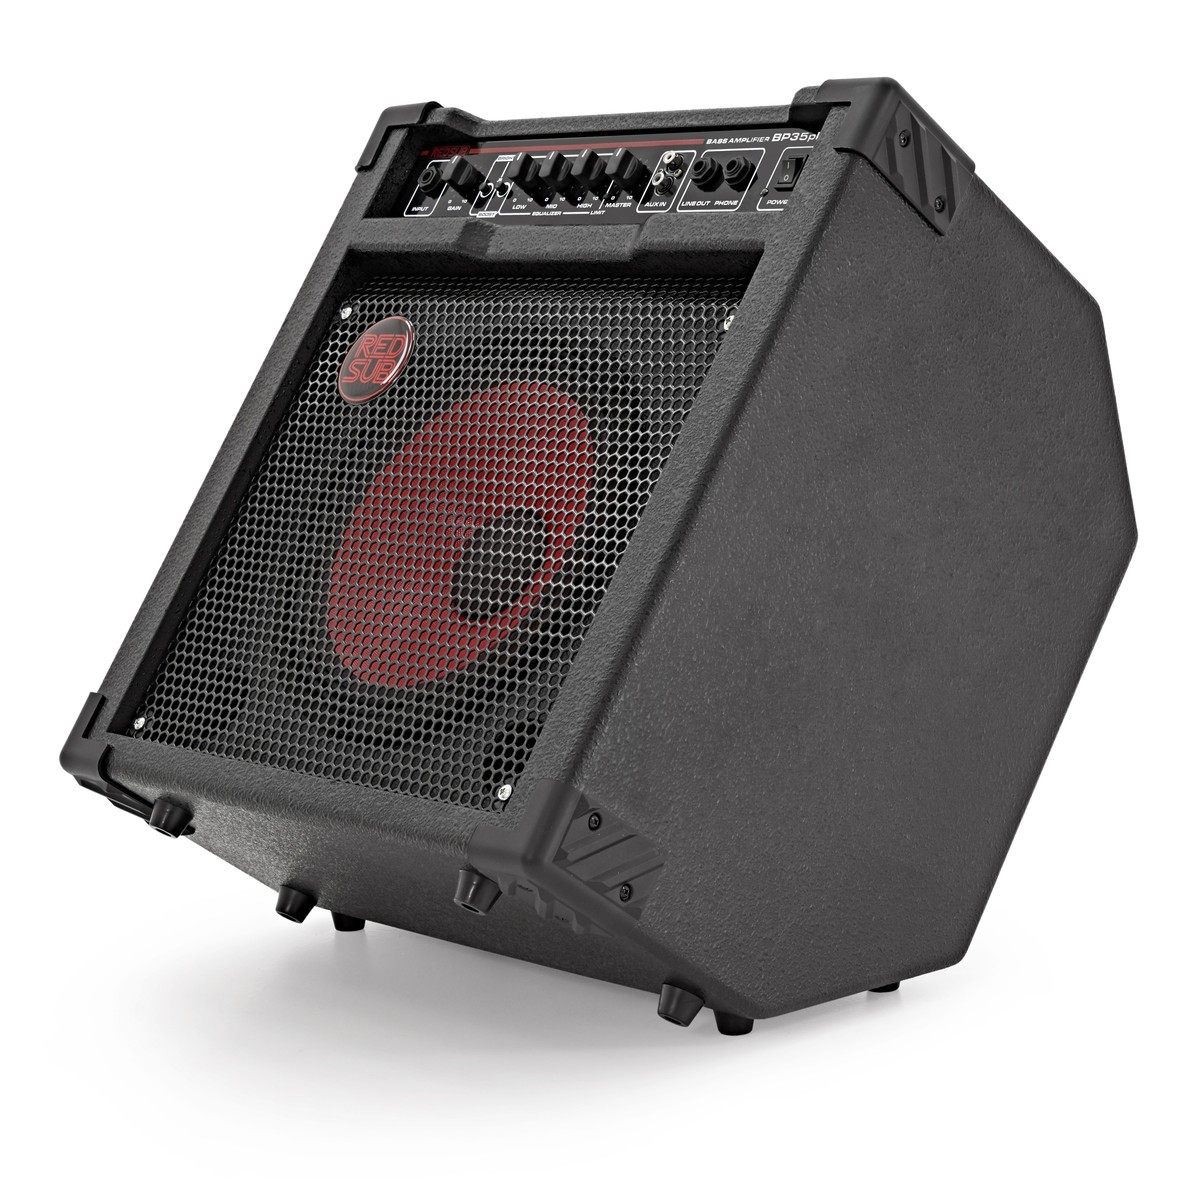 redsub bp35plus 35w bass guitar amplifier at gear4music. Black Bedroom Furniture Sets. Home Design Ideas